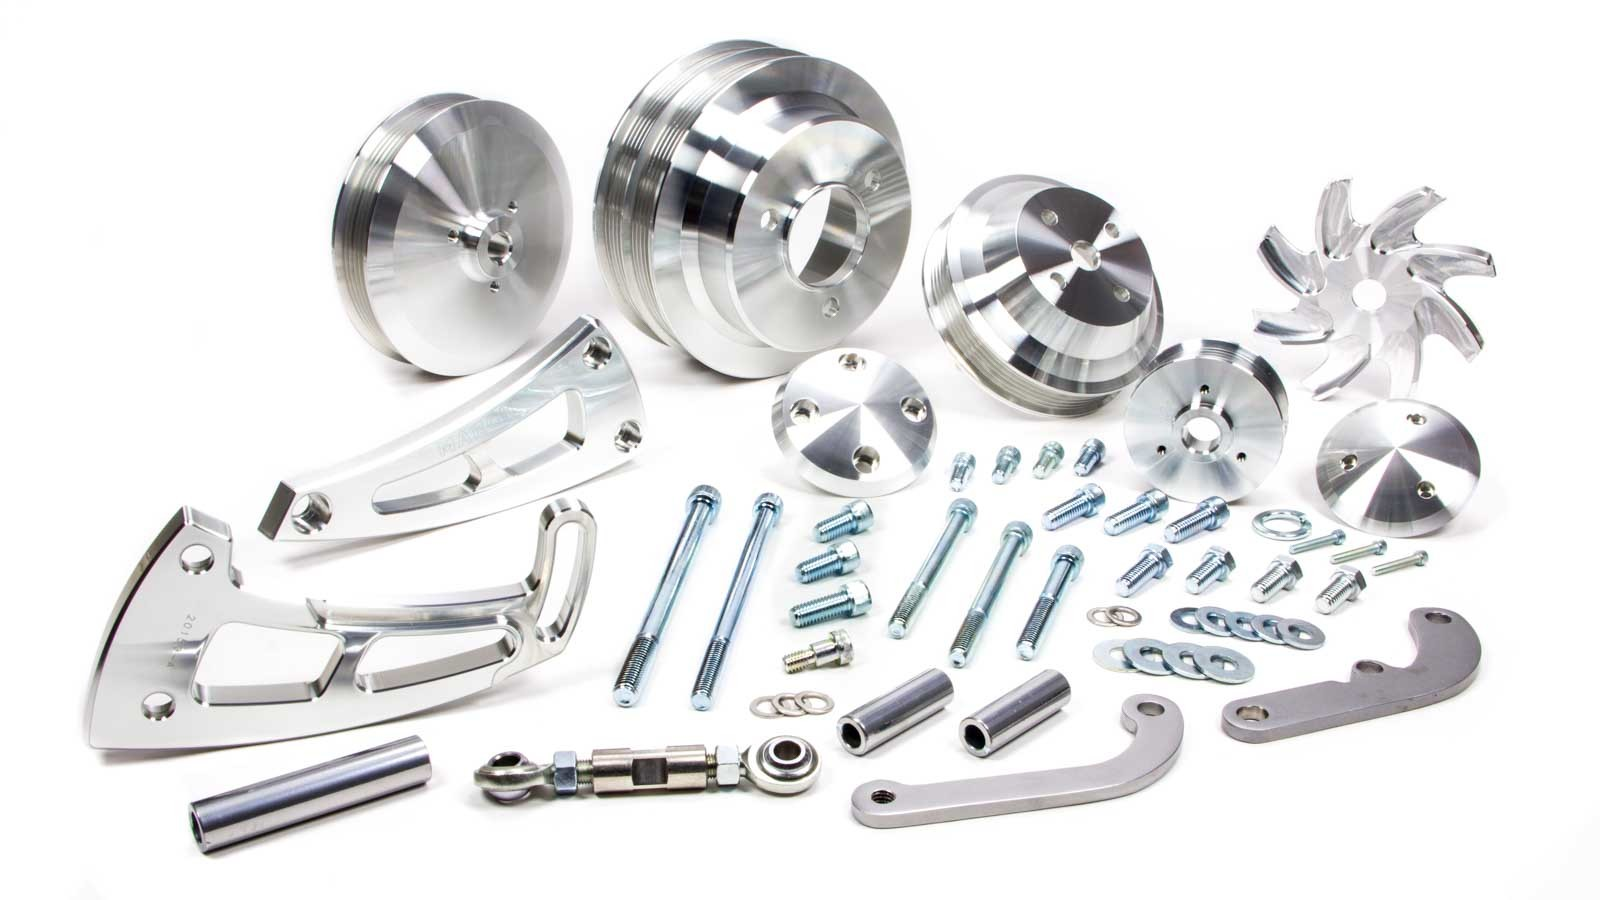 March 23050 Pulley Kit, Ultra, High Water Flow, 6 Rib Serpentine, Aluminum, Clear Powder Coat, Long Water Pump, Big Block Chevy, Kit